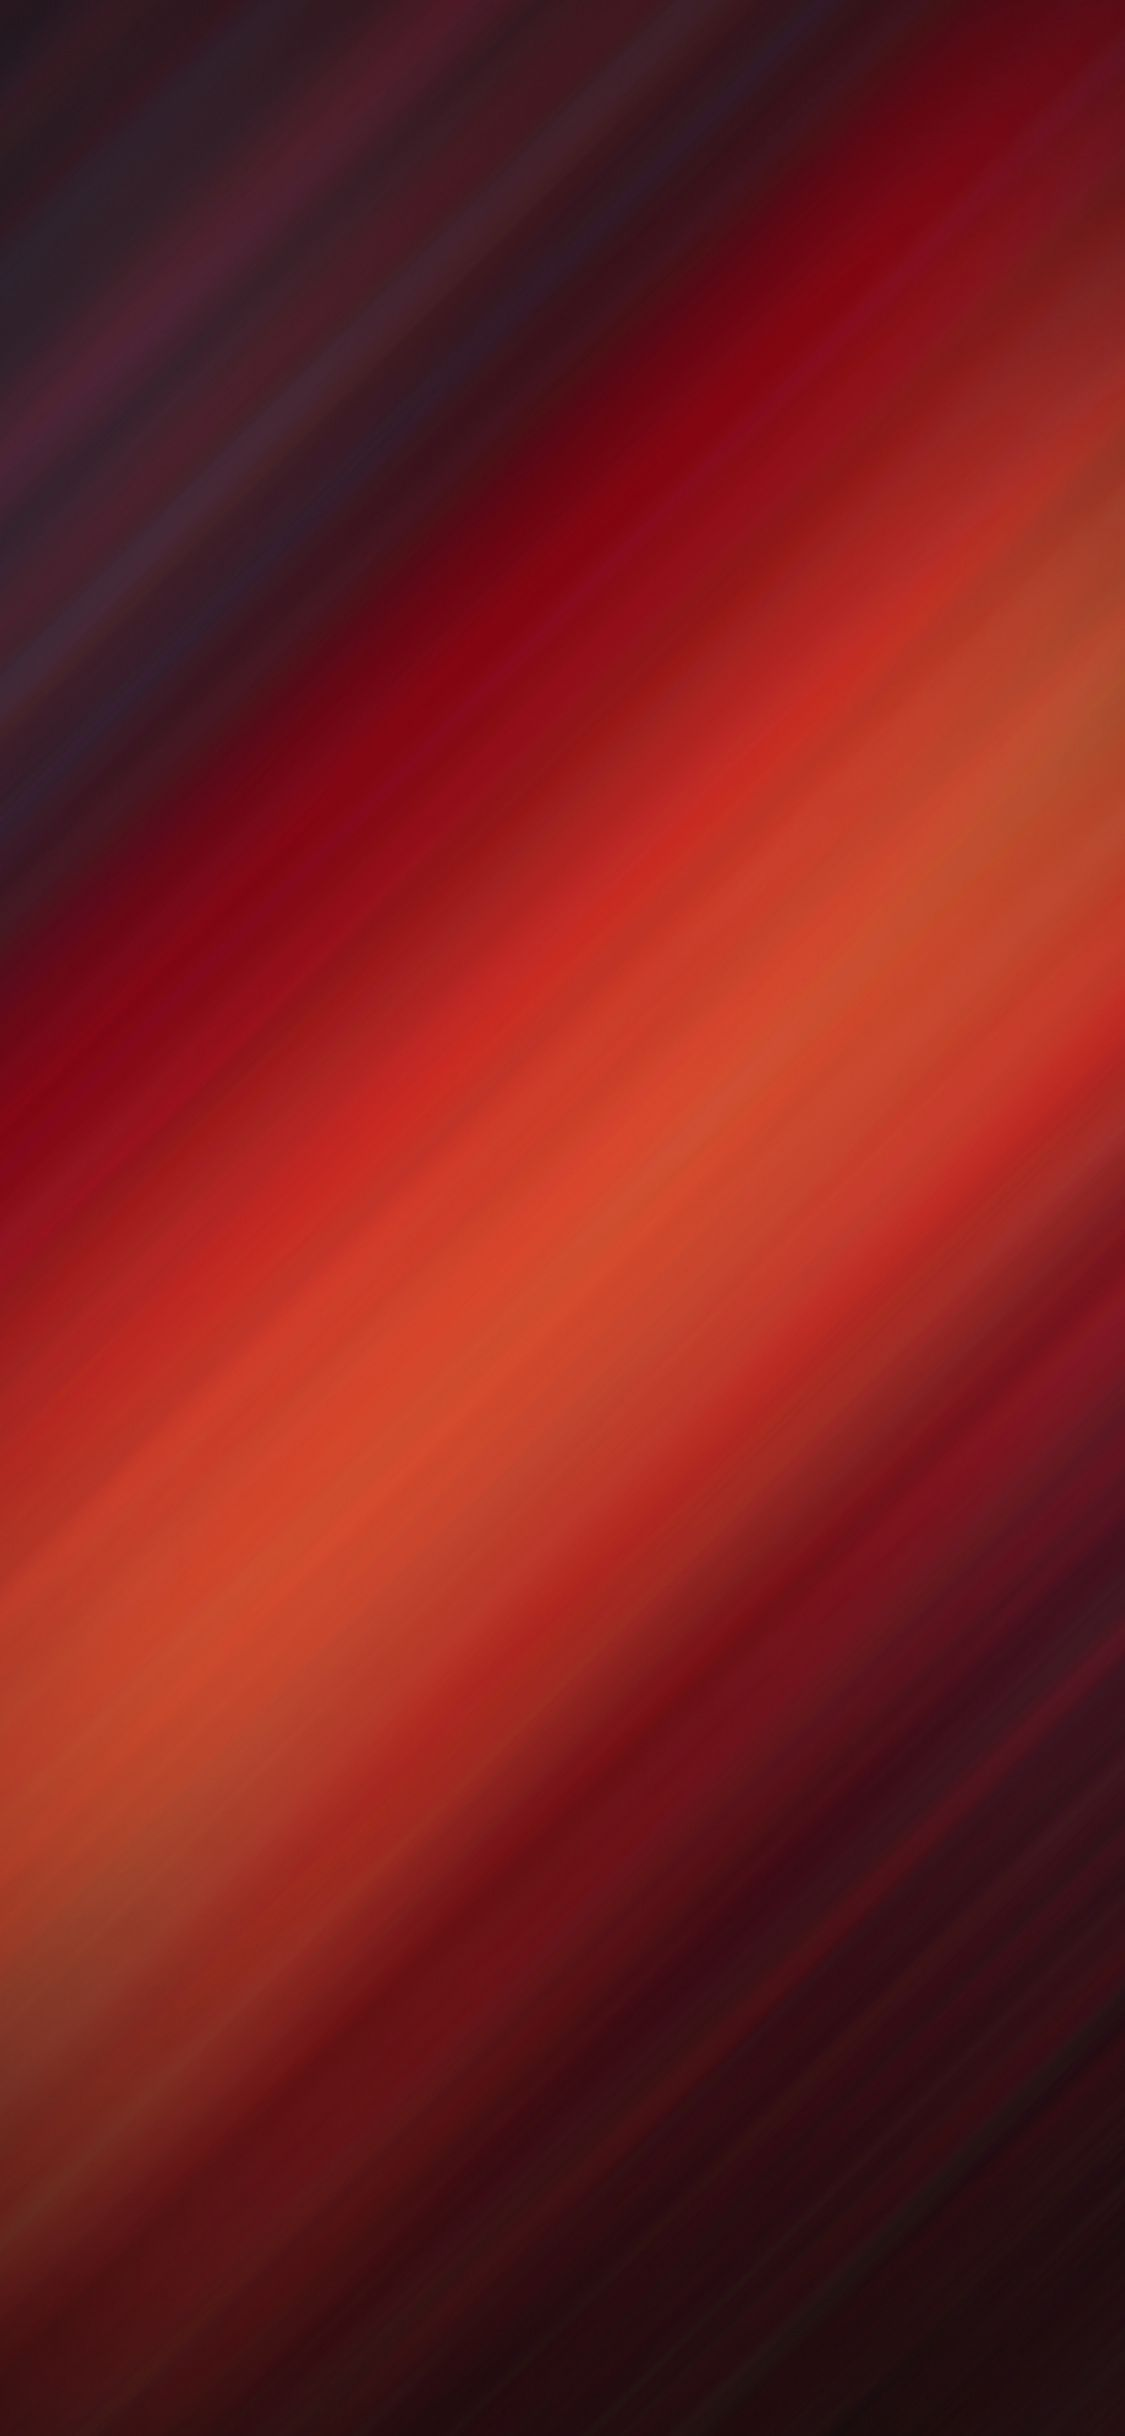 1125x2436 Gradient Stripes Dark Red Blur Wallpaper Red Colour Wallpaper Red Wallpaper Sunset Wallpaper